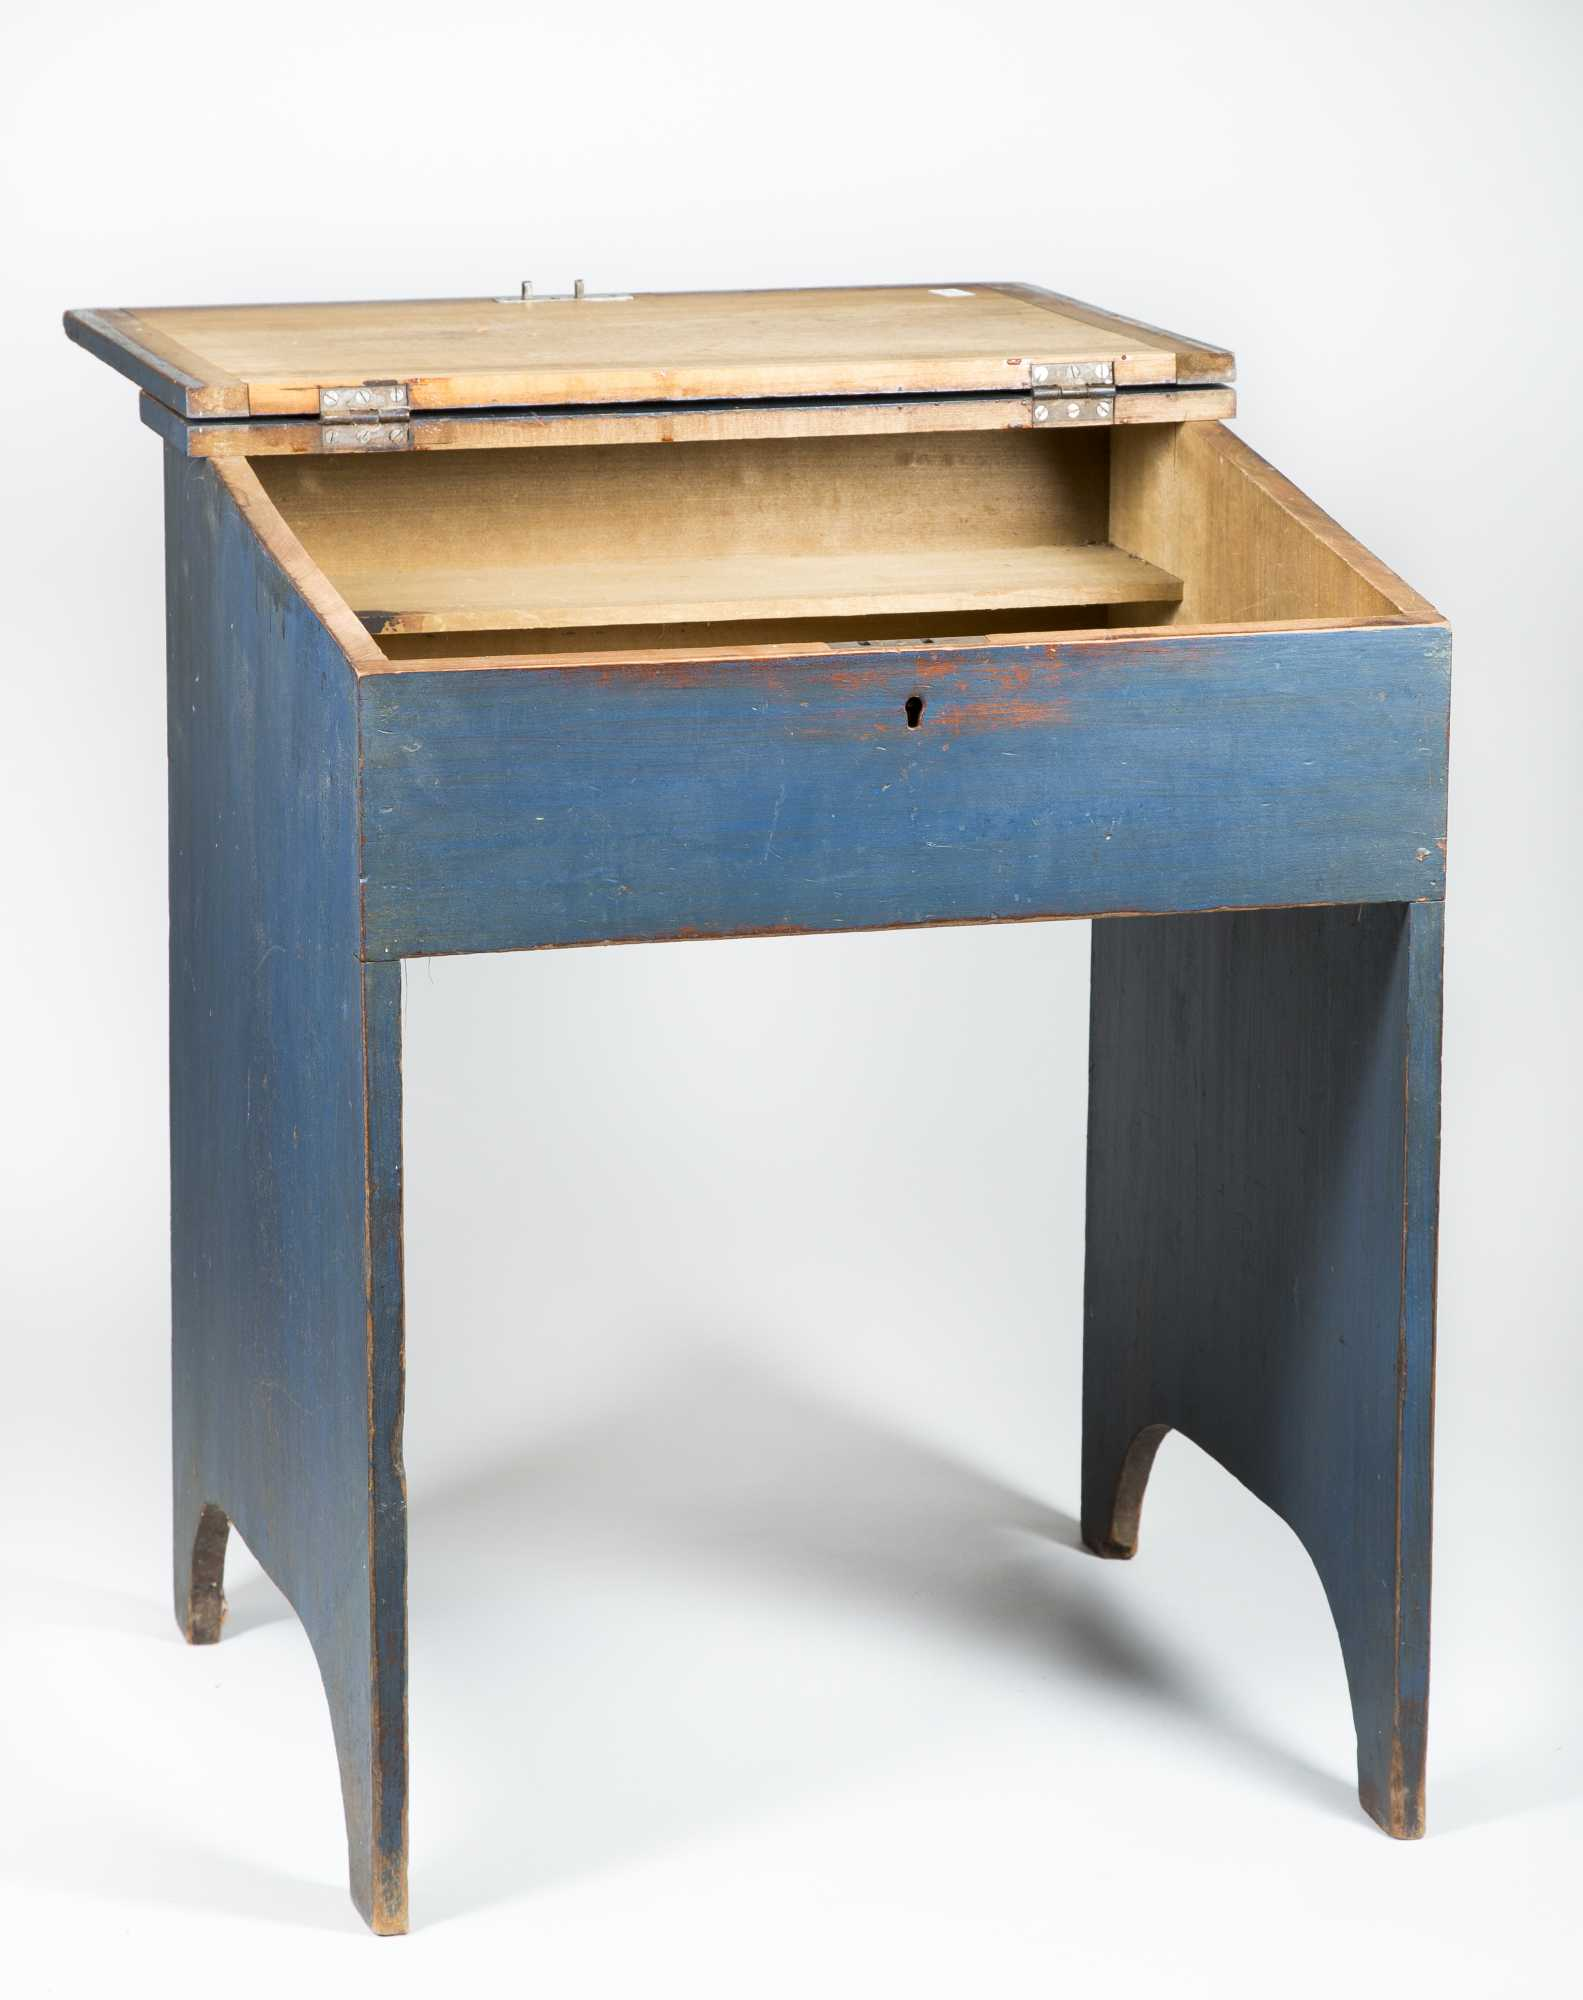 Shaker Blue Painted Childs Desk